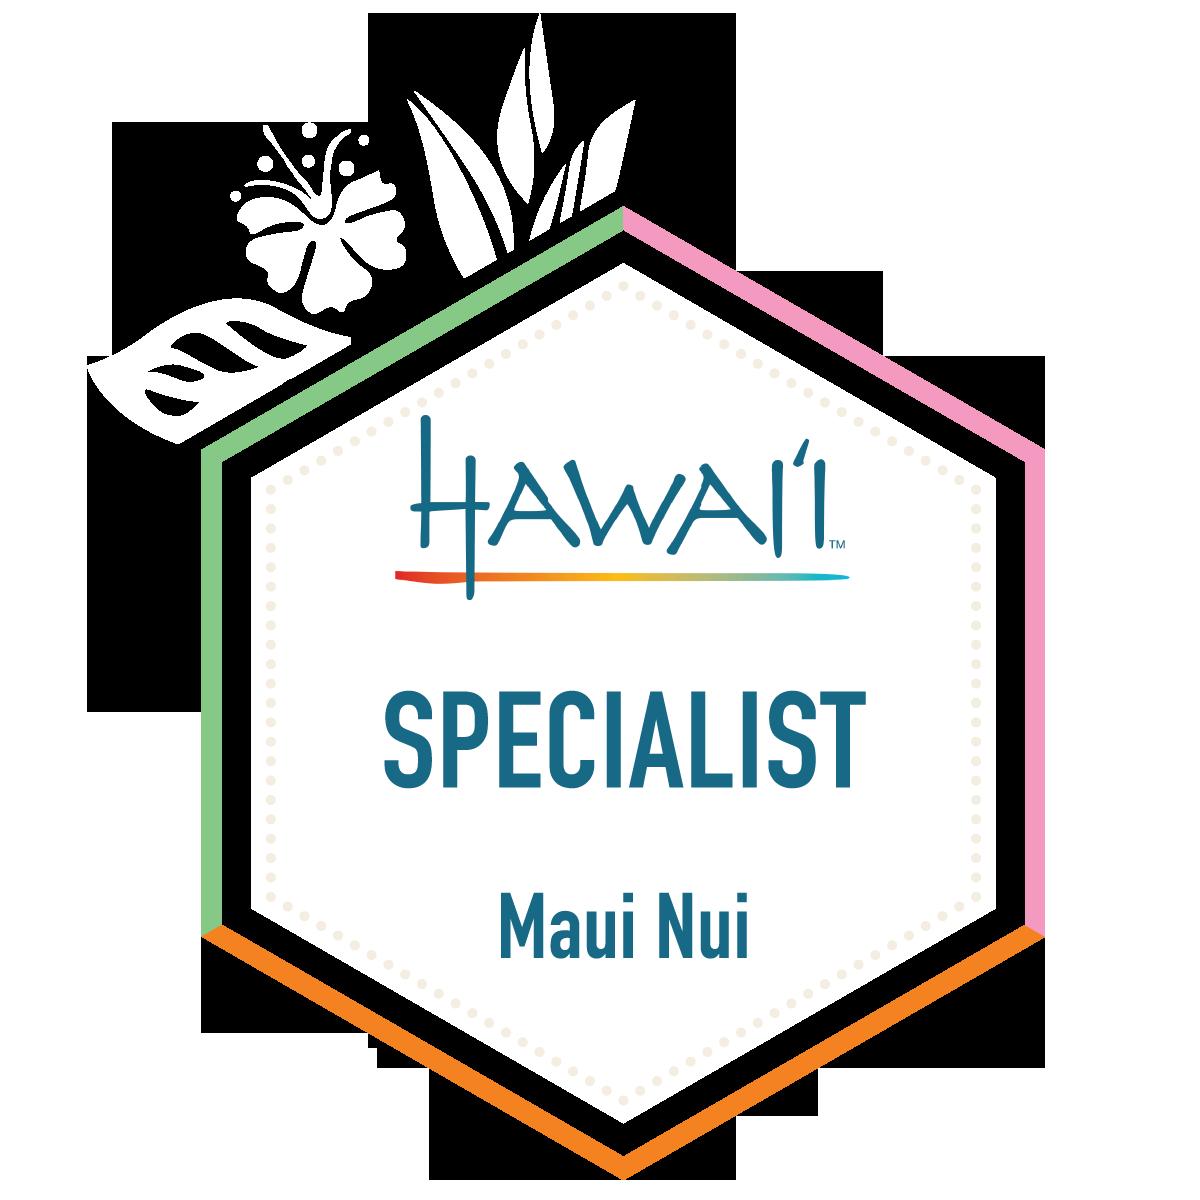 hawaii travel agent